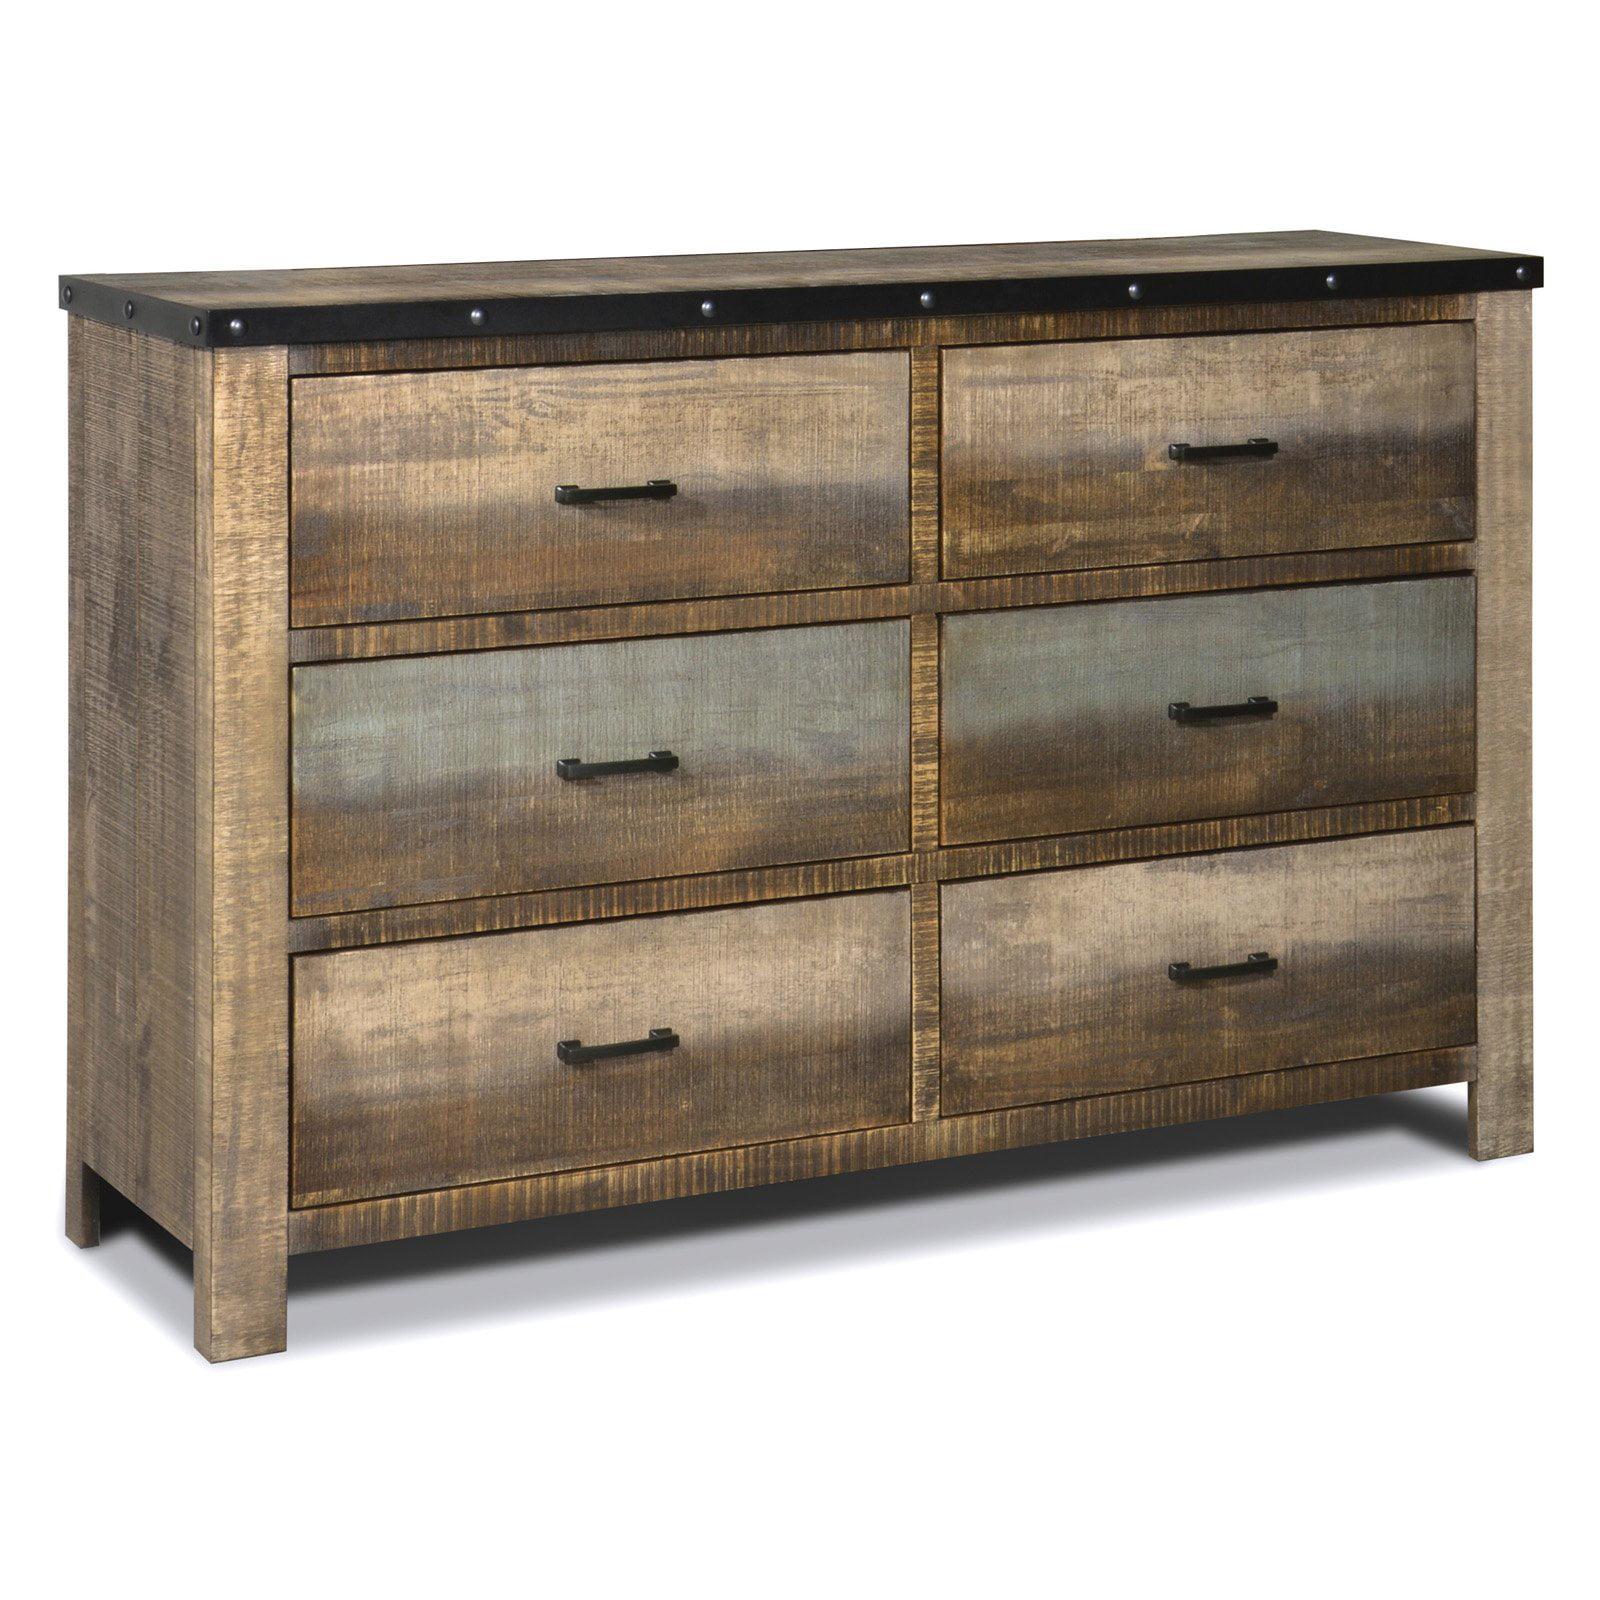 Coaster Furniture Sembene 6 Drawer Dresser